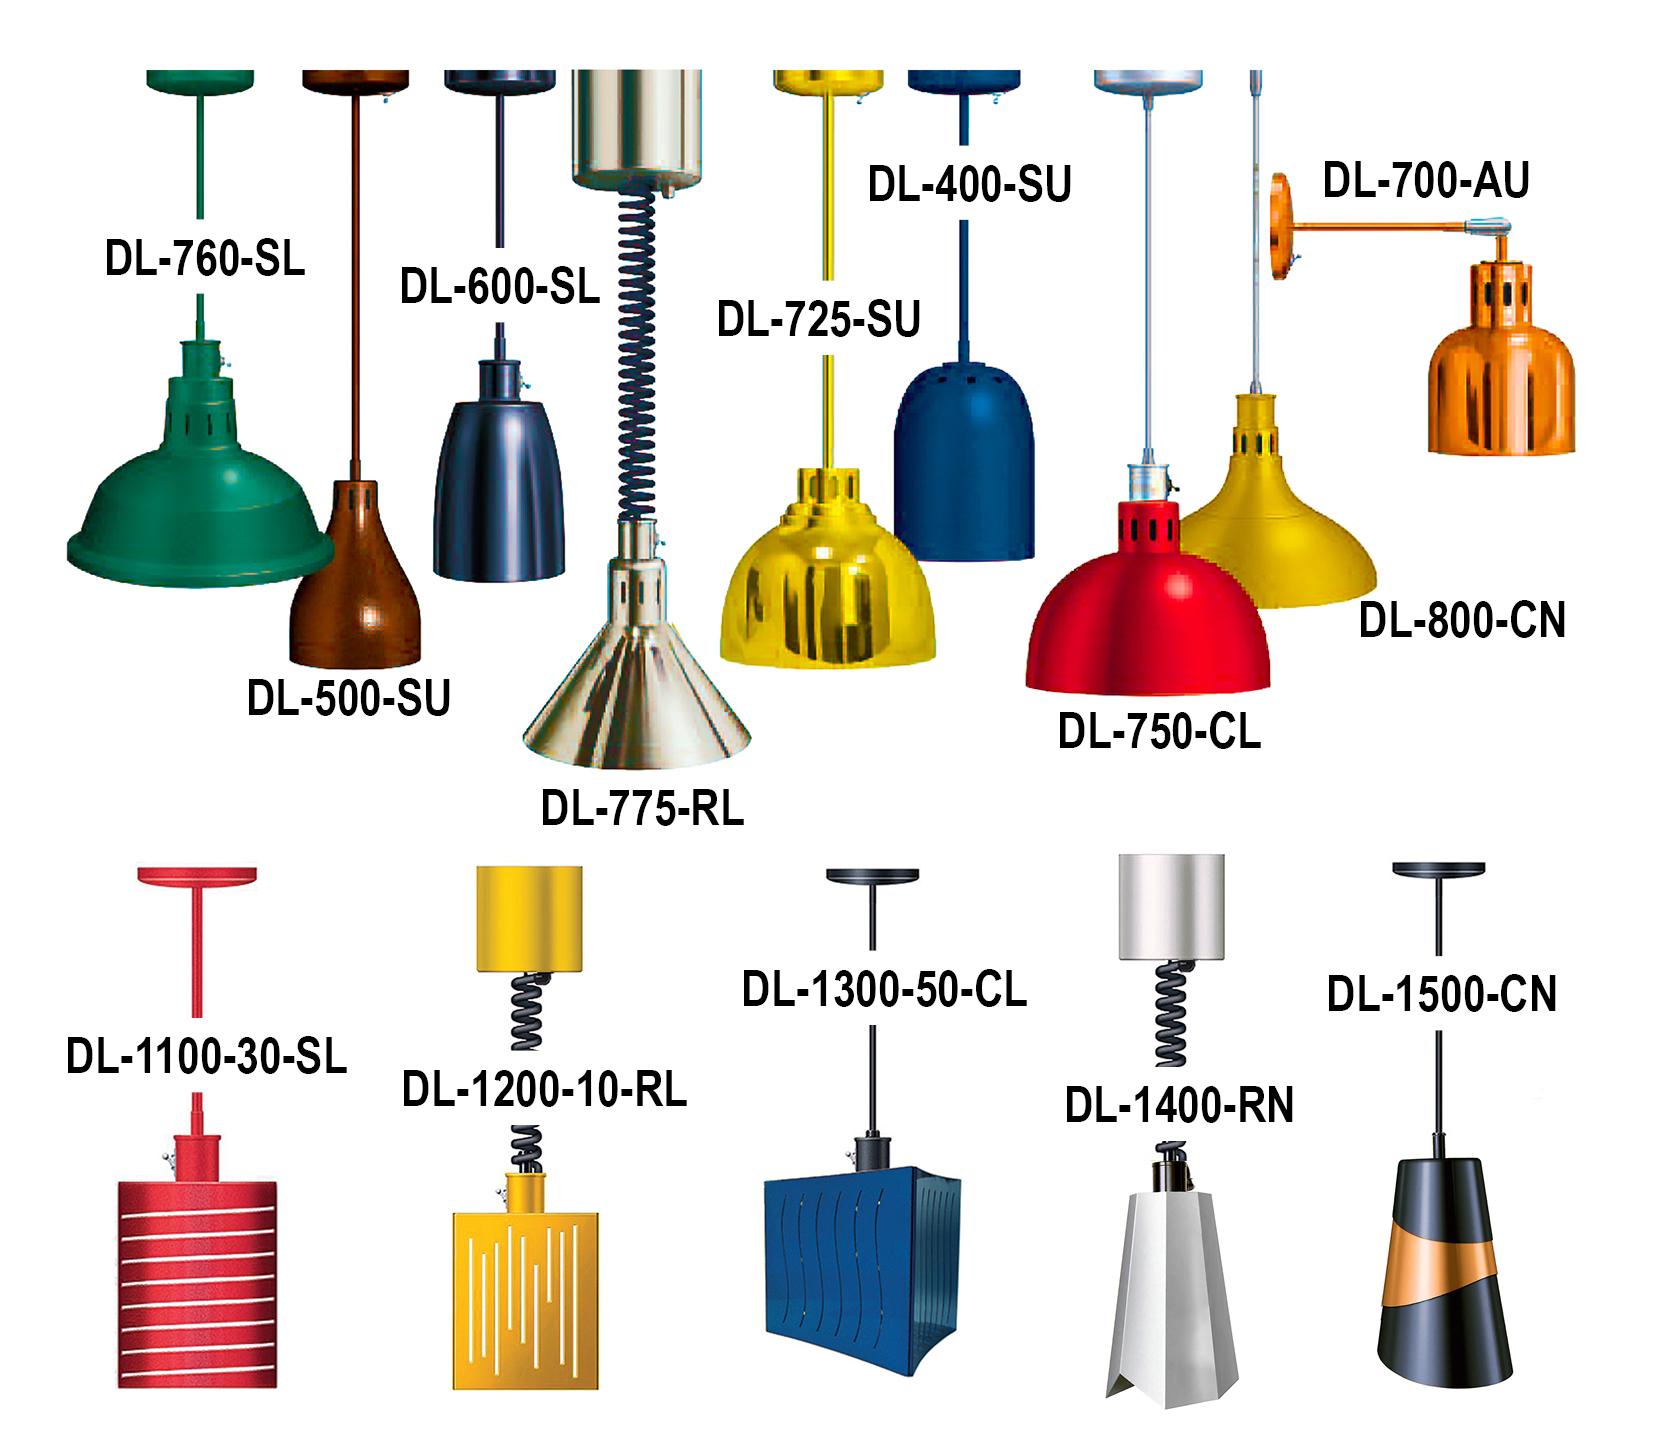 food service machinery dl decorative heat lamps. Black Bedroom Furniture Sets. Home Design Ideas